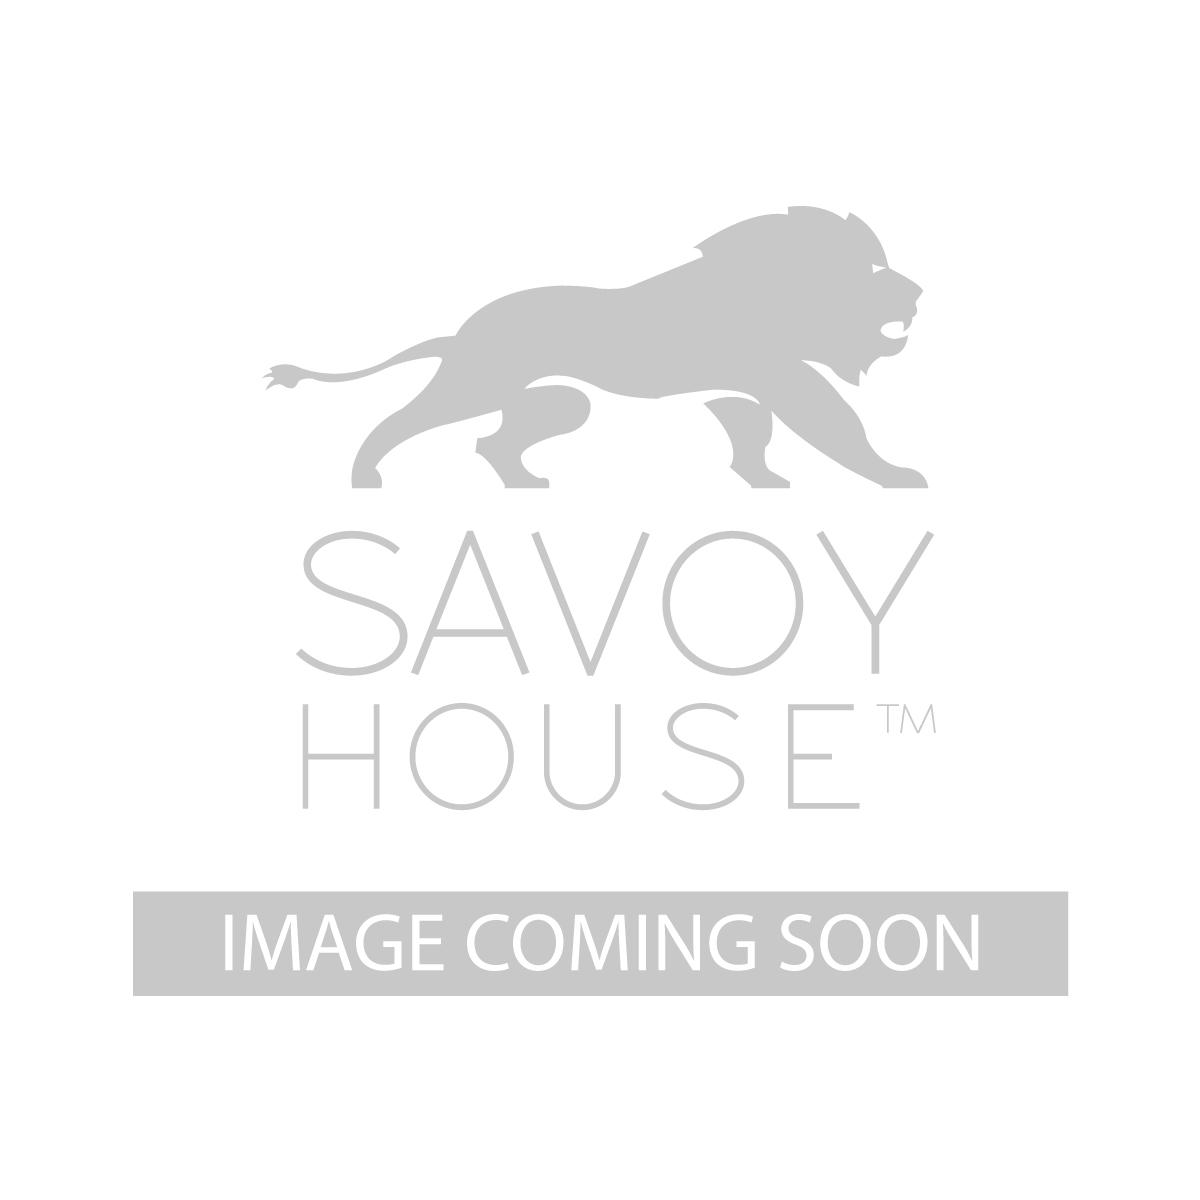 Aberdeen Flush Mount  sc 1 st  Savoy House & 6-150-14-109 Aberdeen Flush Mount by Savoy House